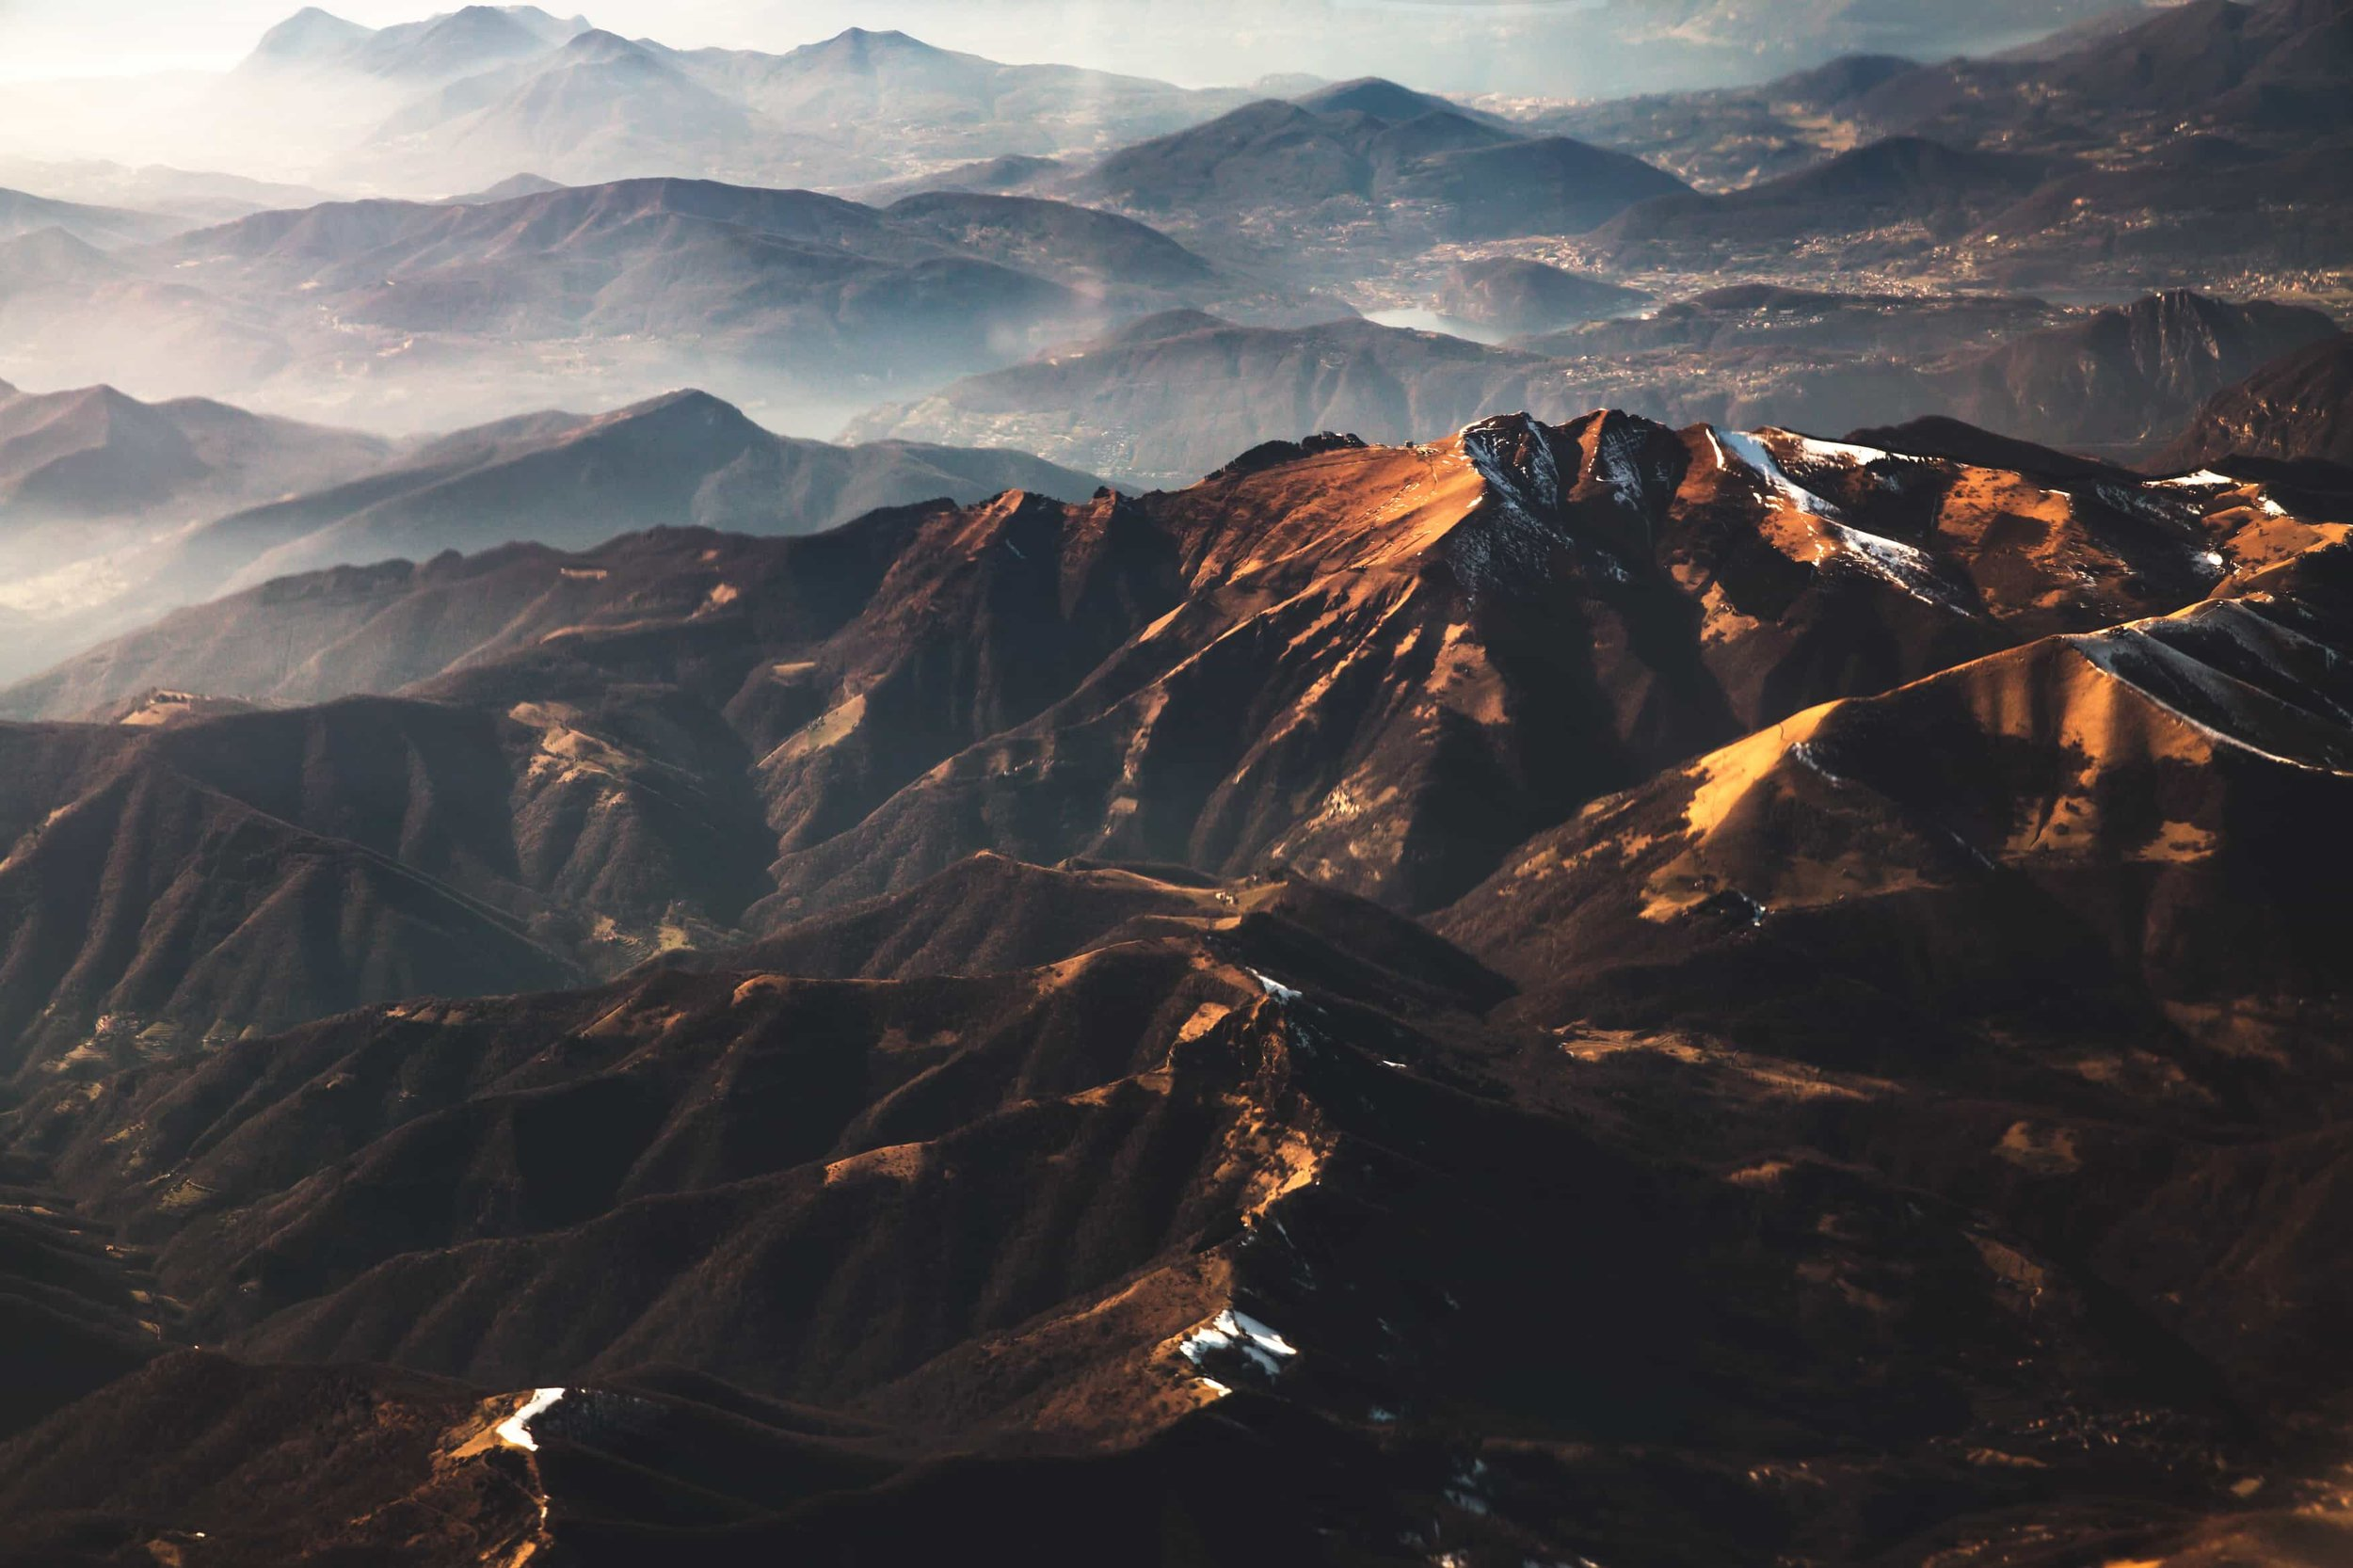 aerial_landscape_photography_fabio_burrelli_photographer_1.jpg